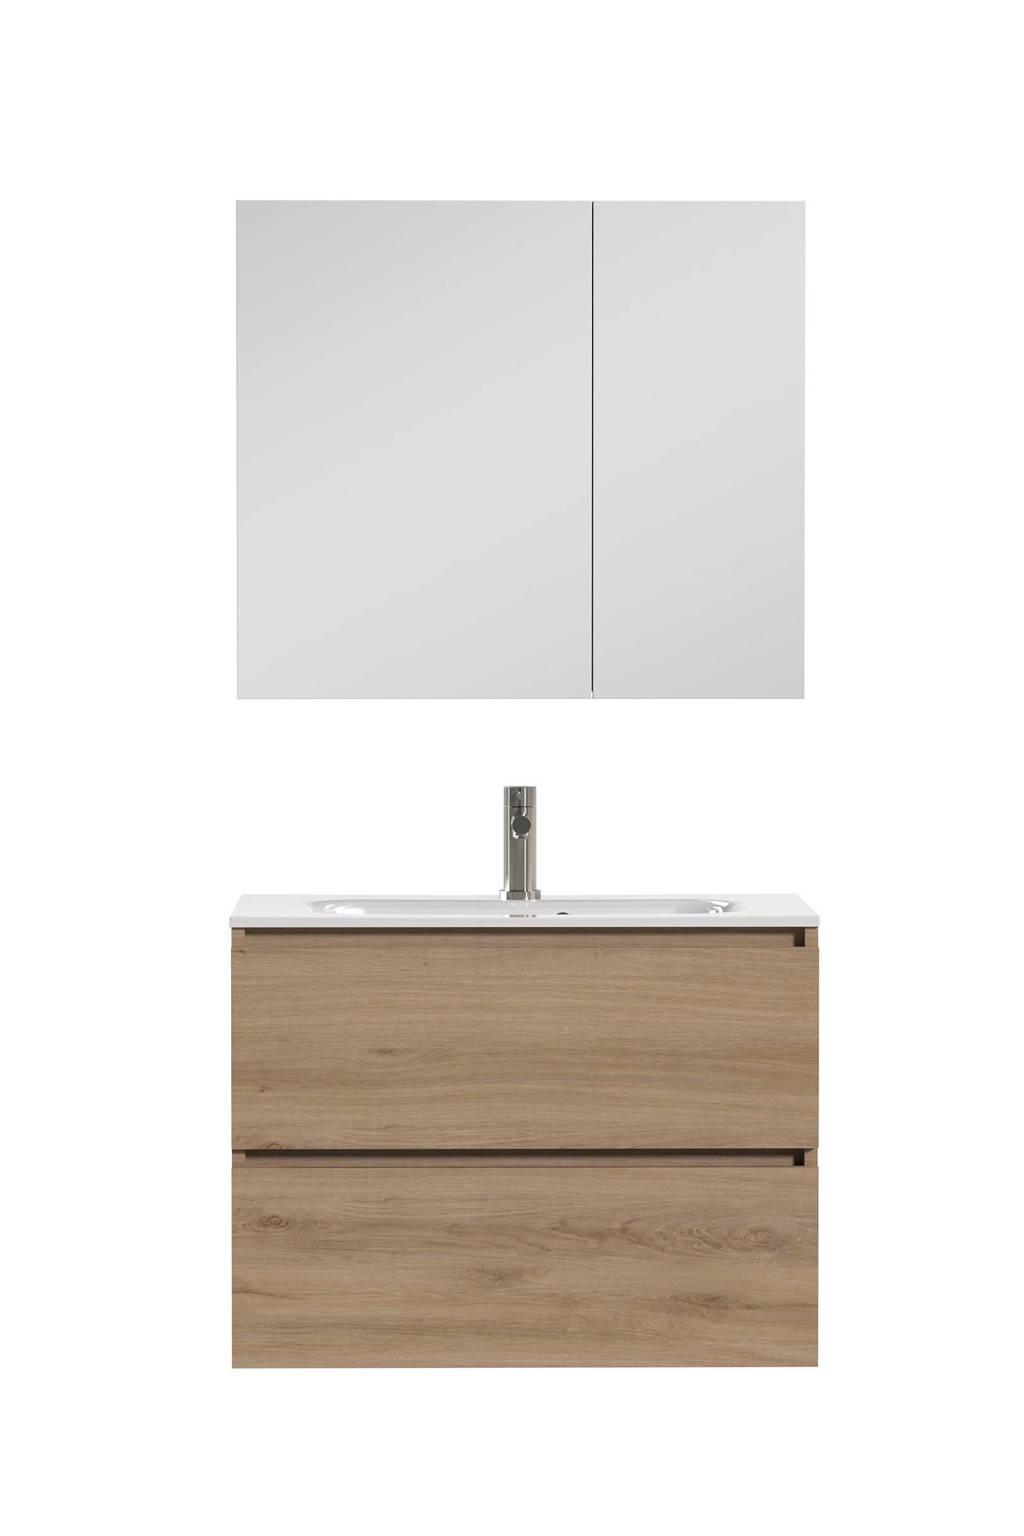 Tiger Loft Badkamermeubel 80cm met spiegelkast en witte wastafel, Eiken met witte wasbak